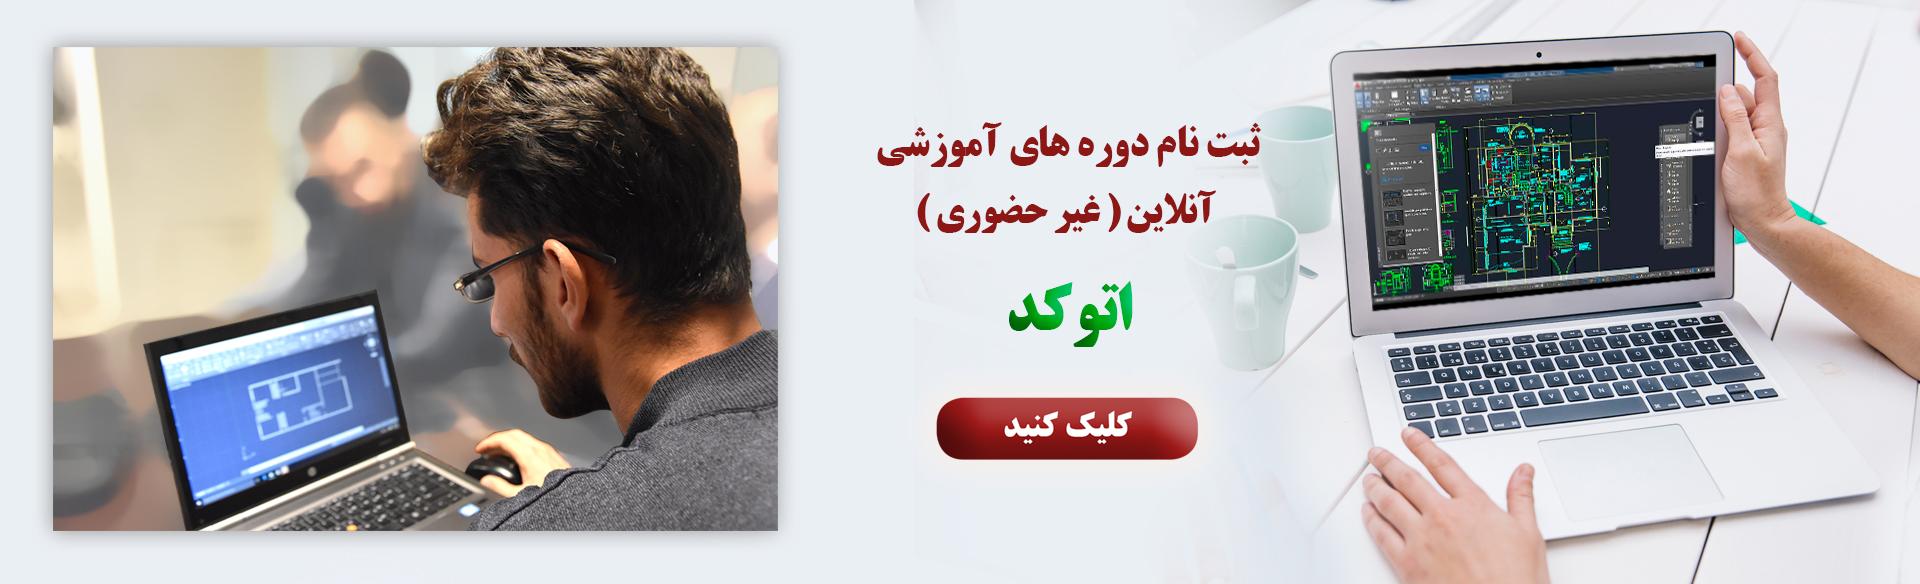 norooz autocad online class - آموزش